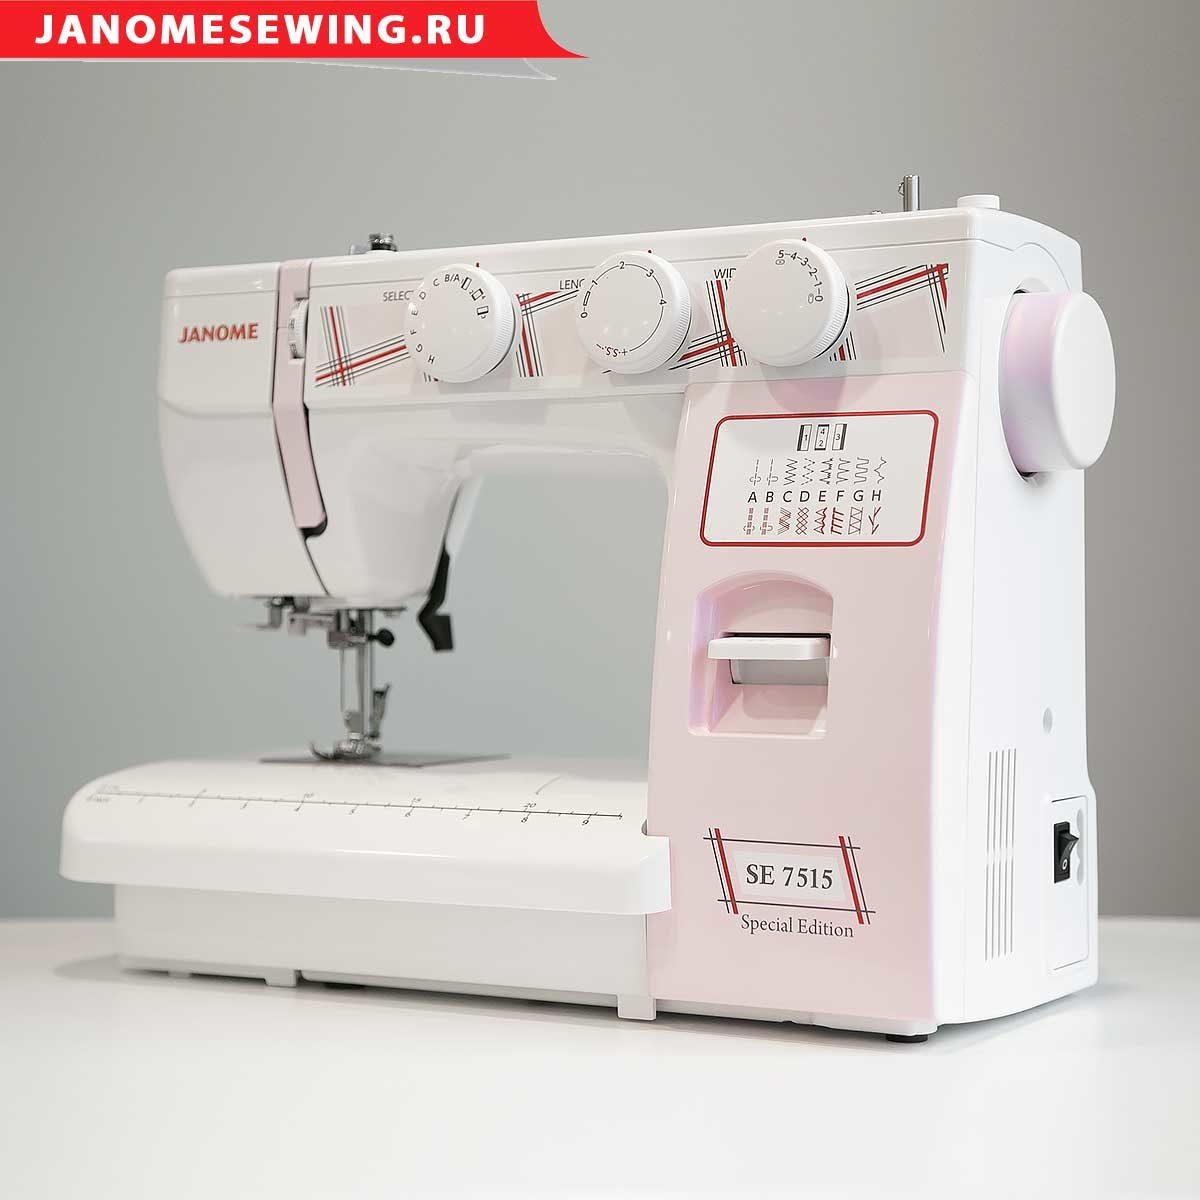 Janome SE 7515